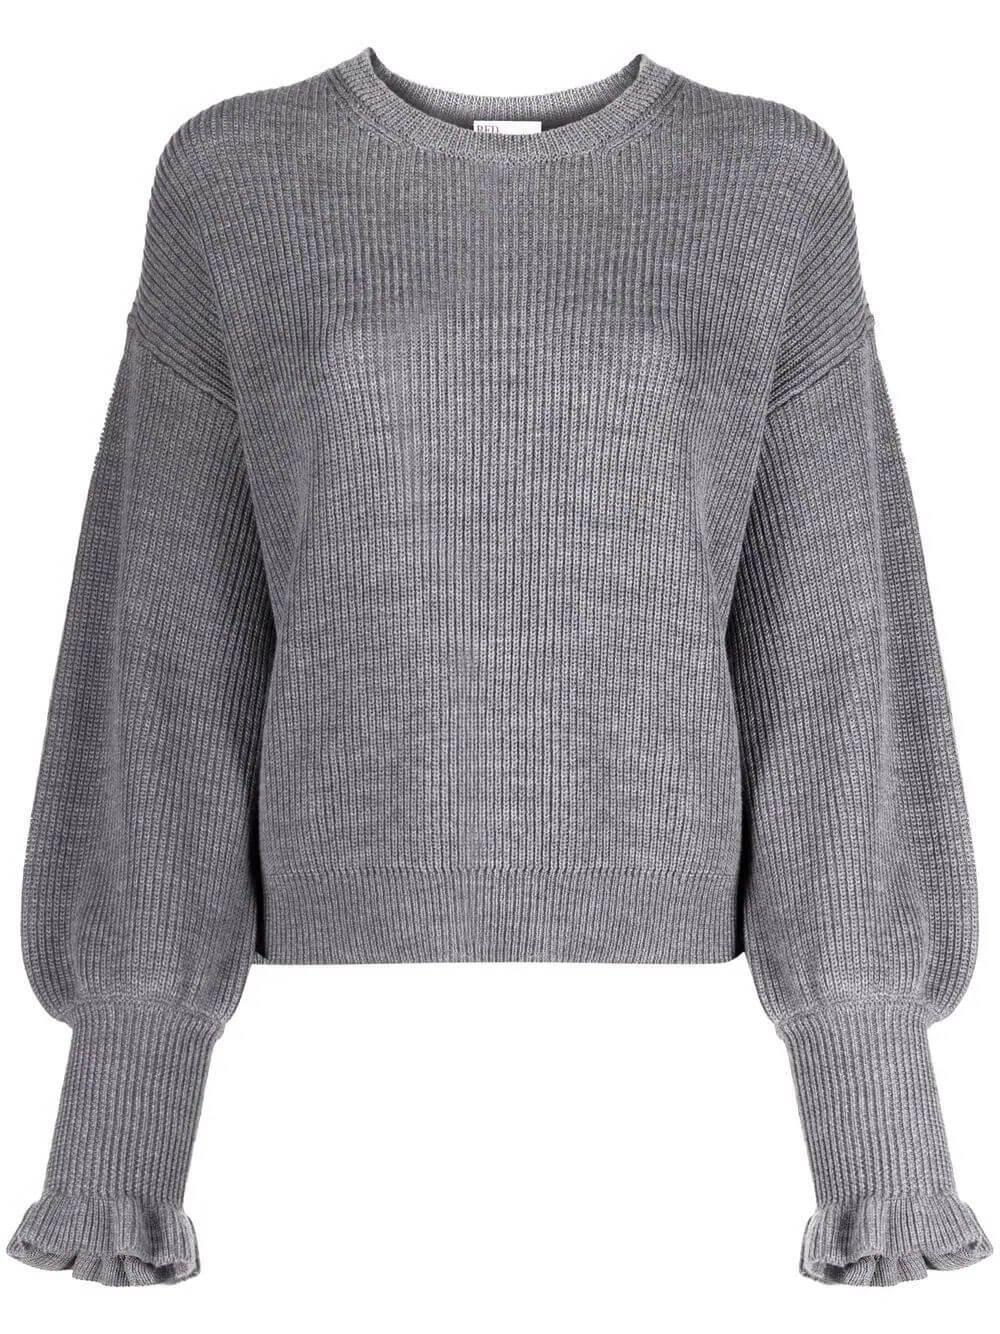 Ruffle Cuff Sweater Item # WR0KC10Q678